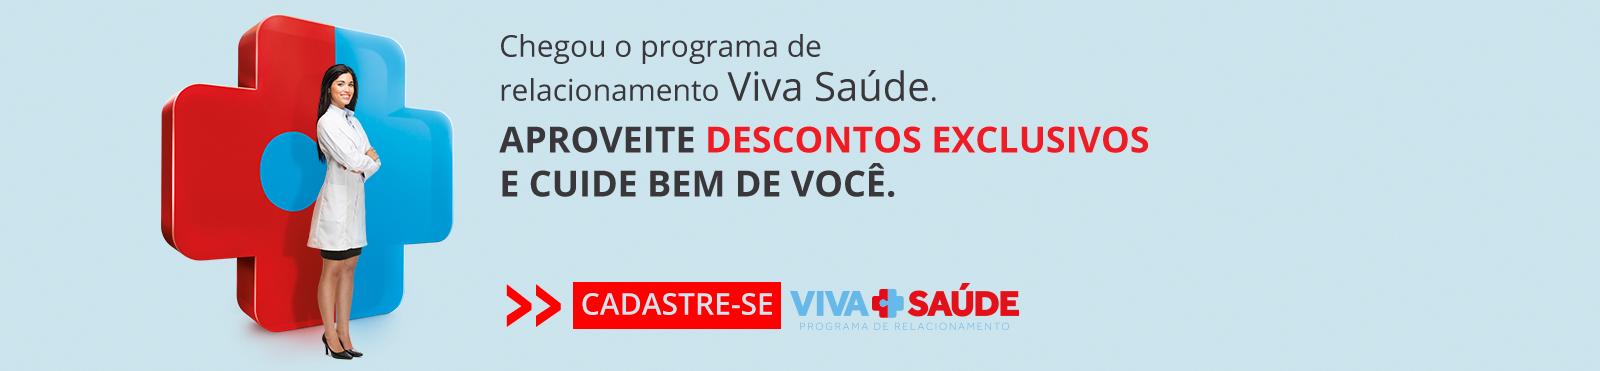 banner-programa-viva+saude